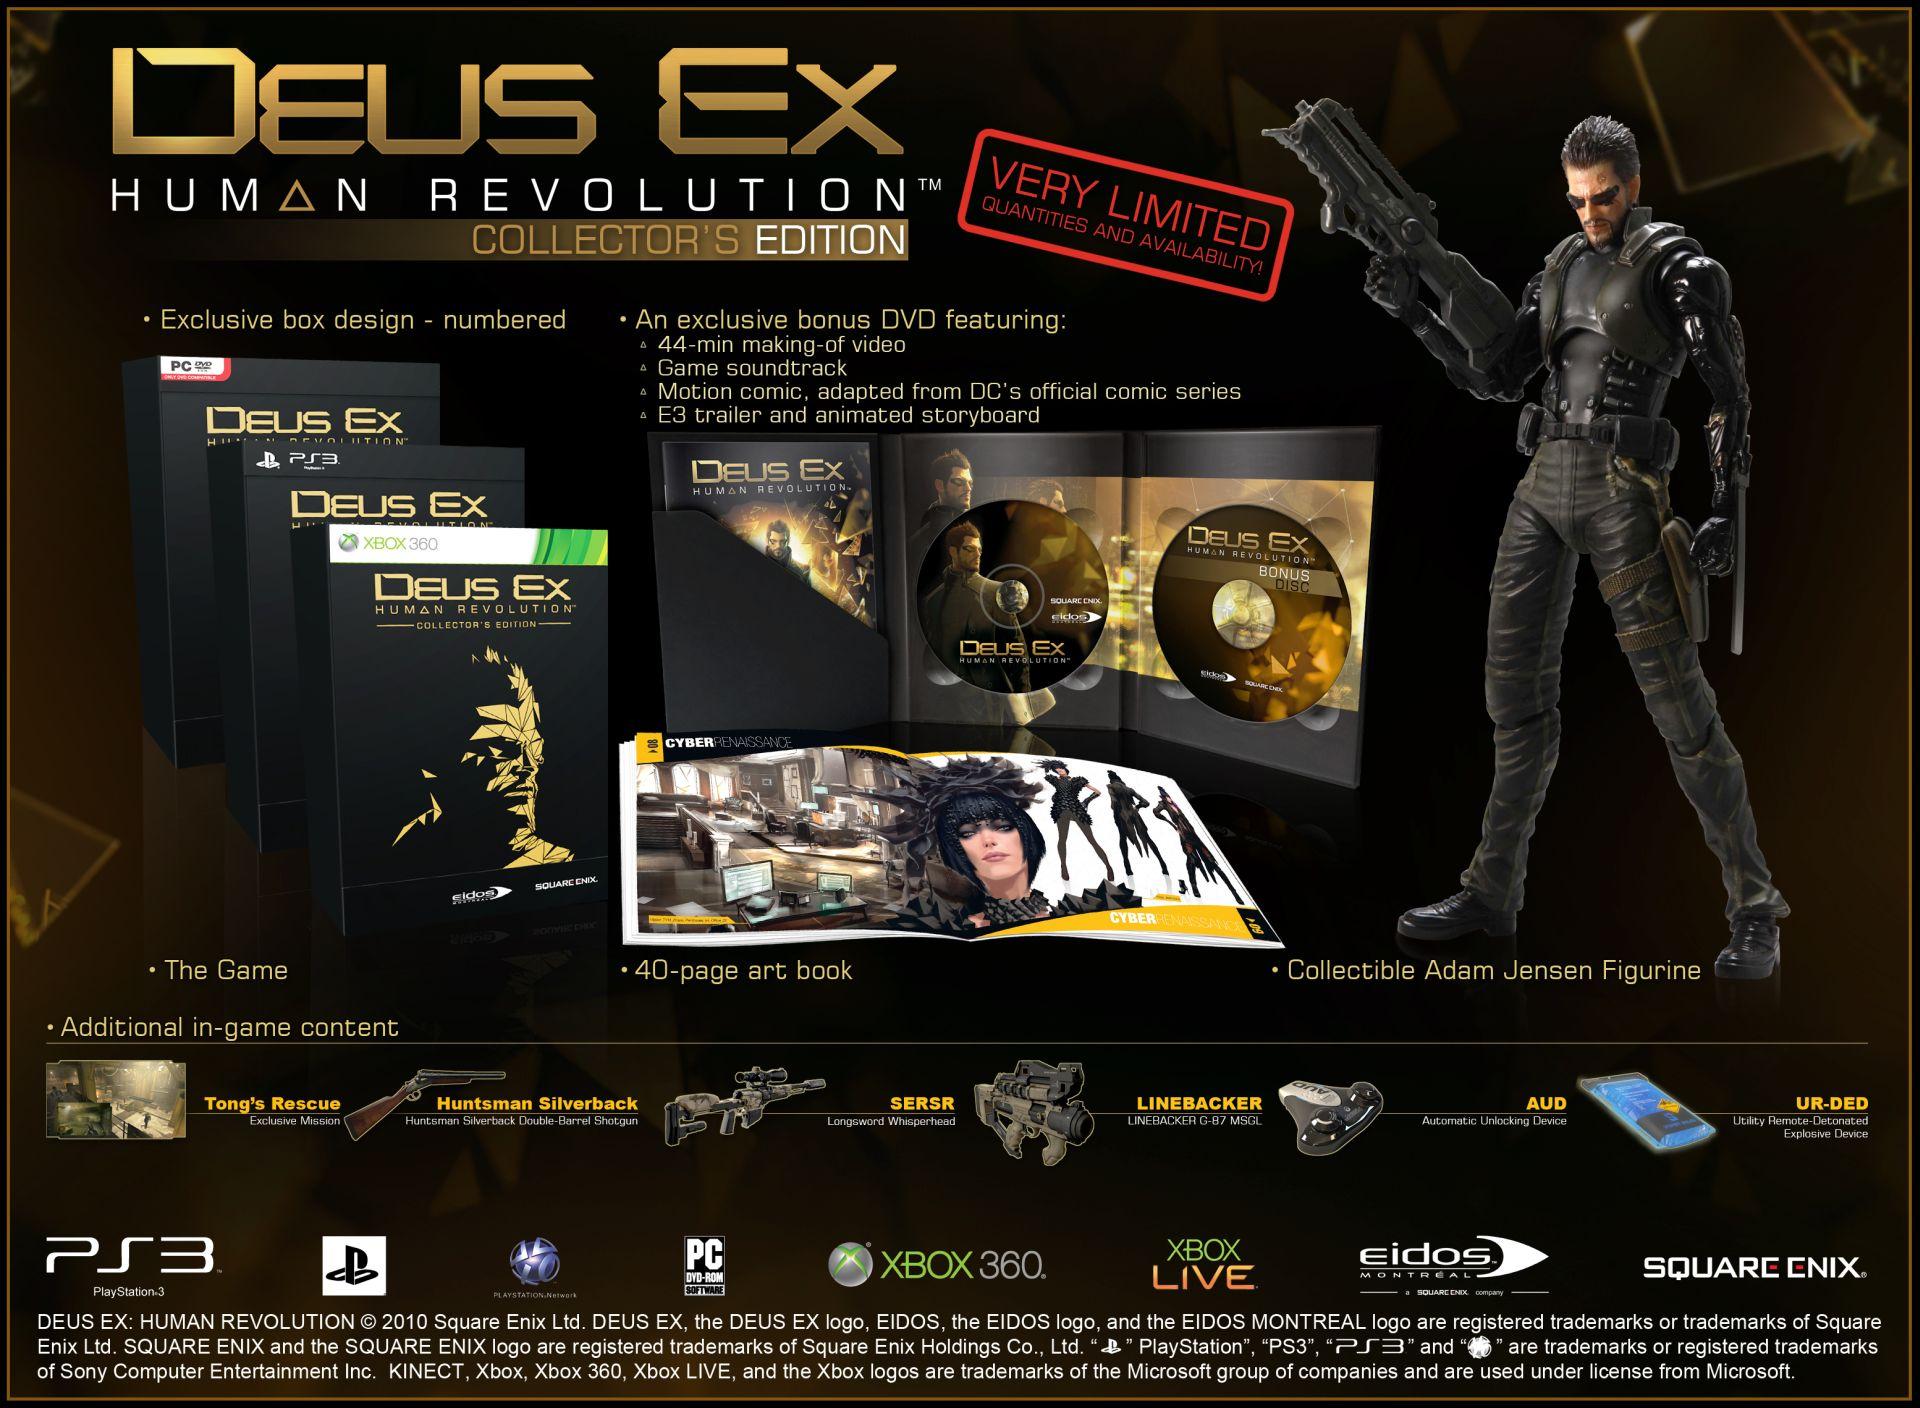 Jak si vybrat edici Deus Ex: Human Revolution 48407